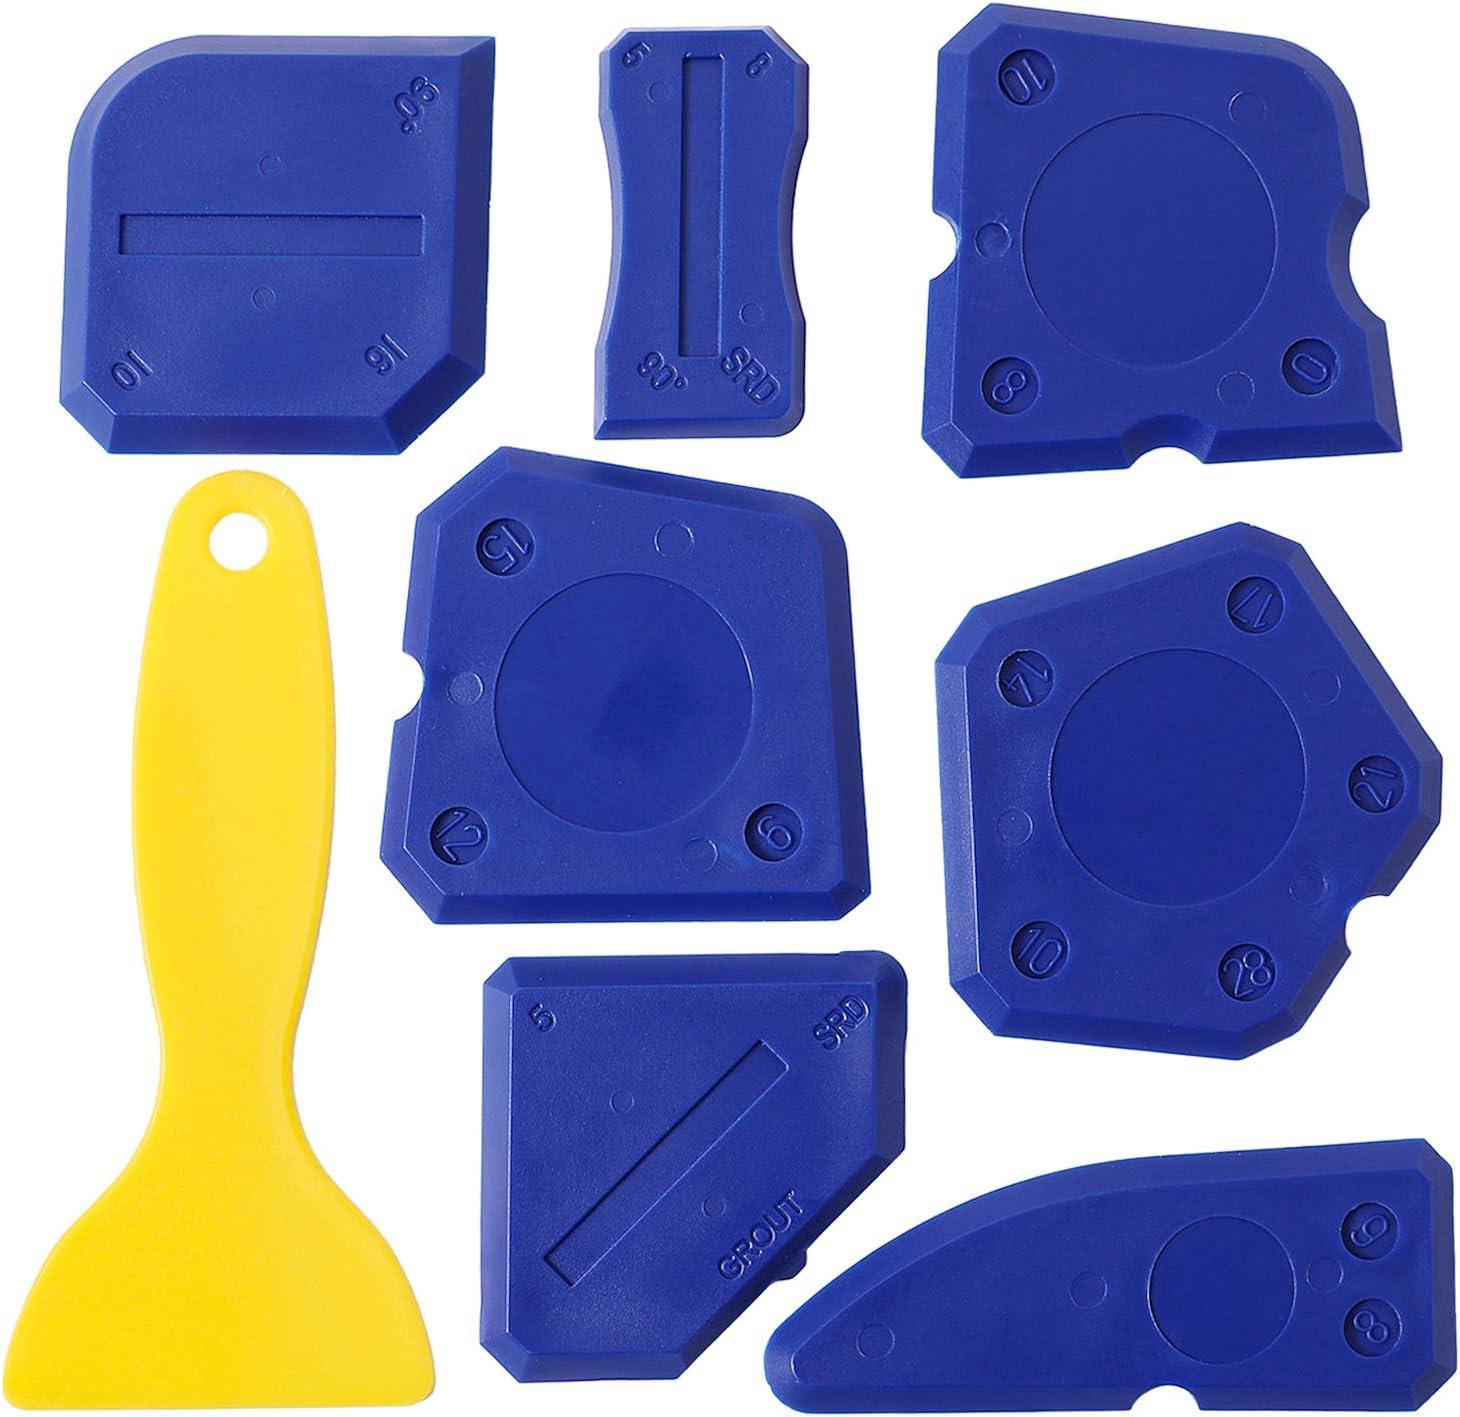 8 Pieces Cheap bargain Caulk Tool Kit Tools Regular store Caulkin Finishing Sealant Silicone